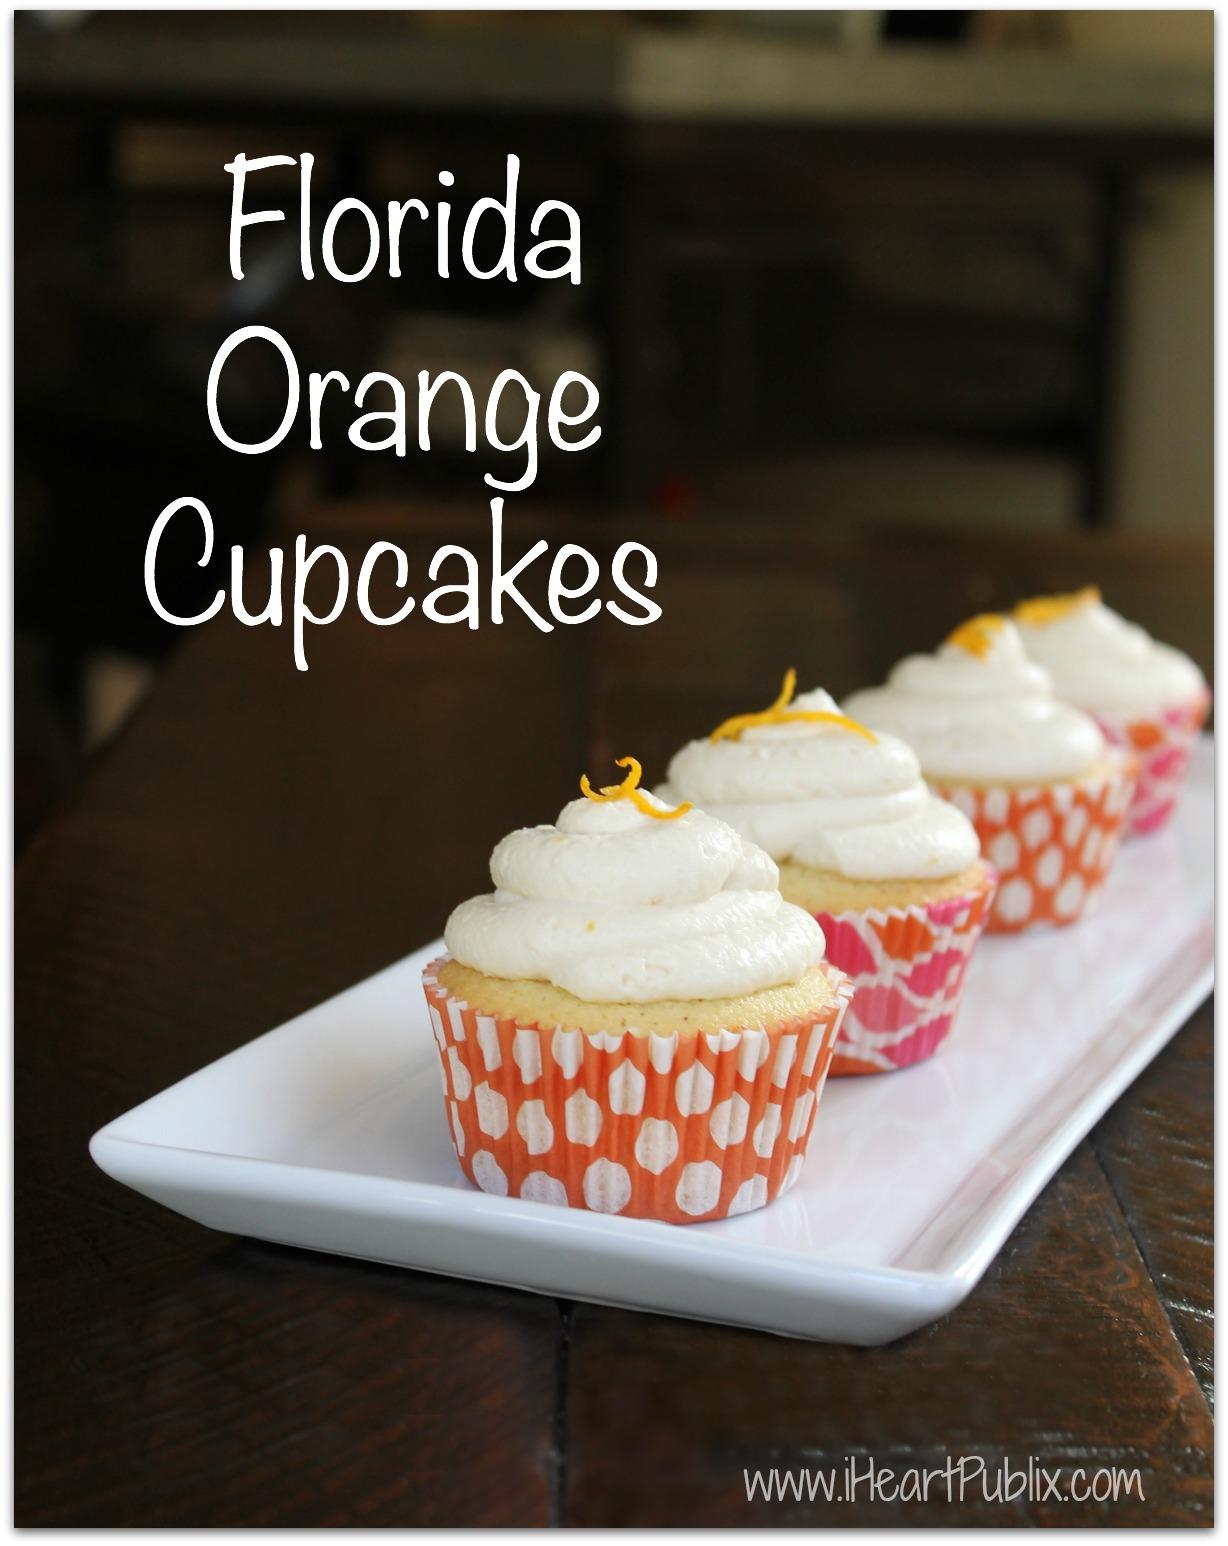 florida orange cupcakes recipe reminder to print your coupon for